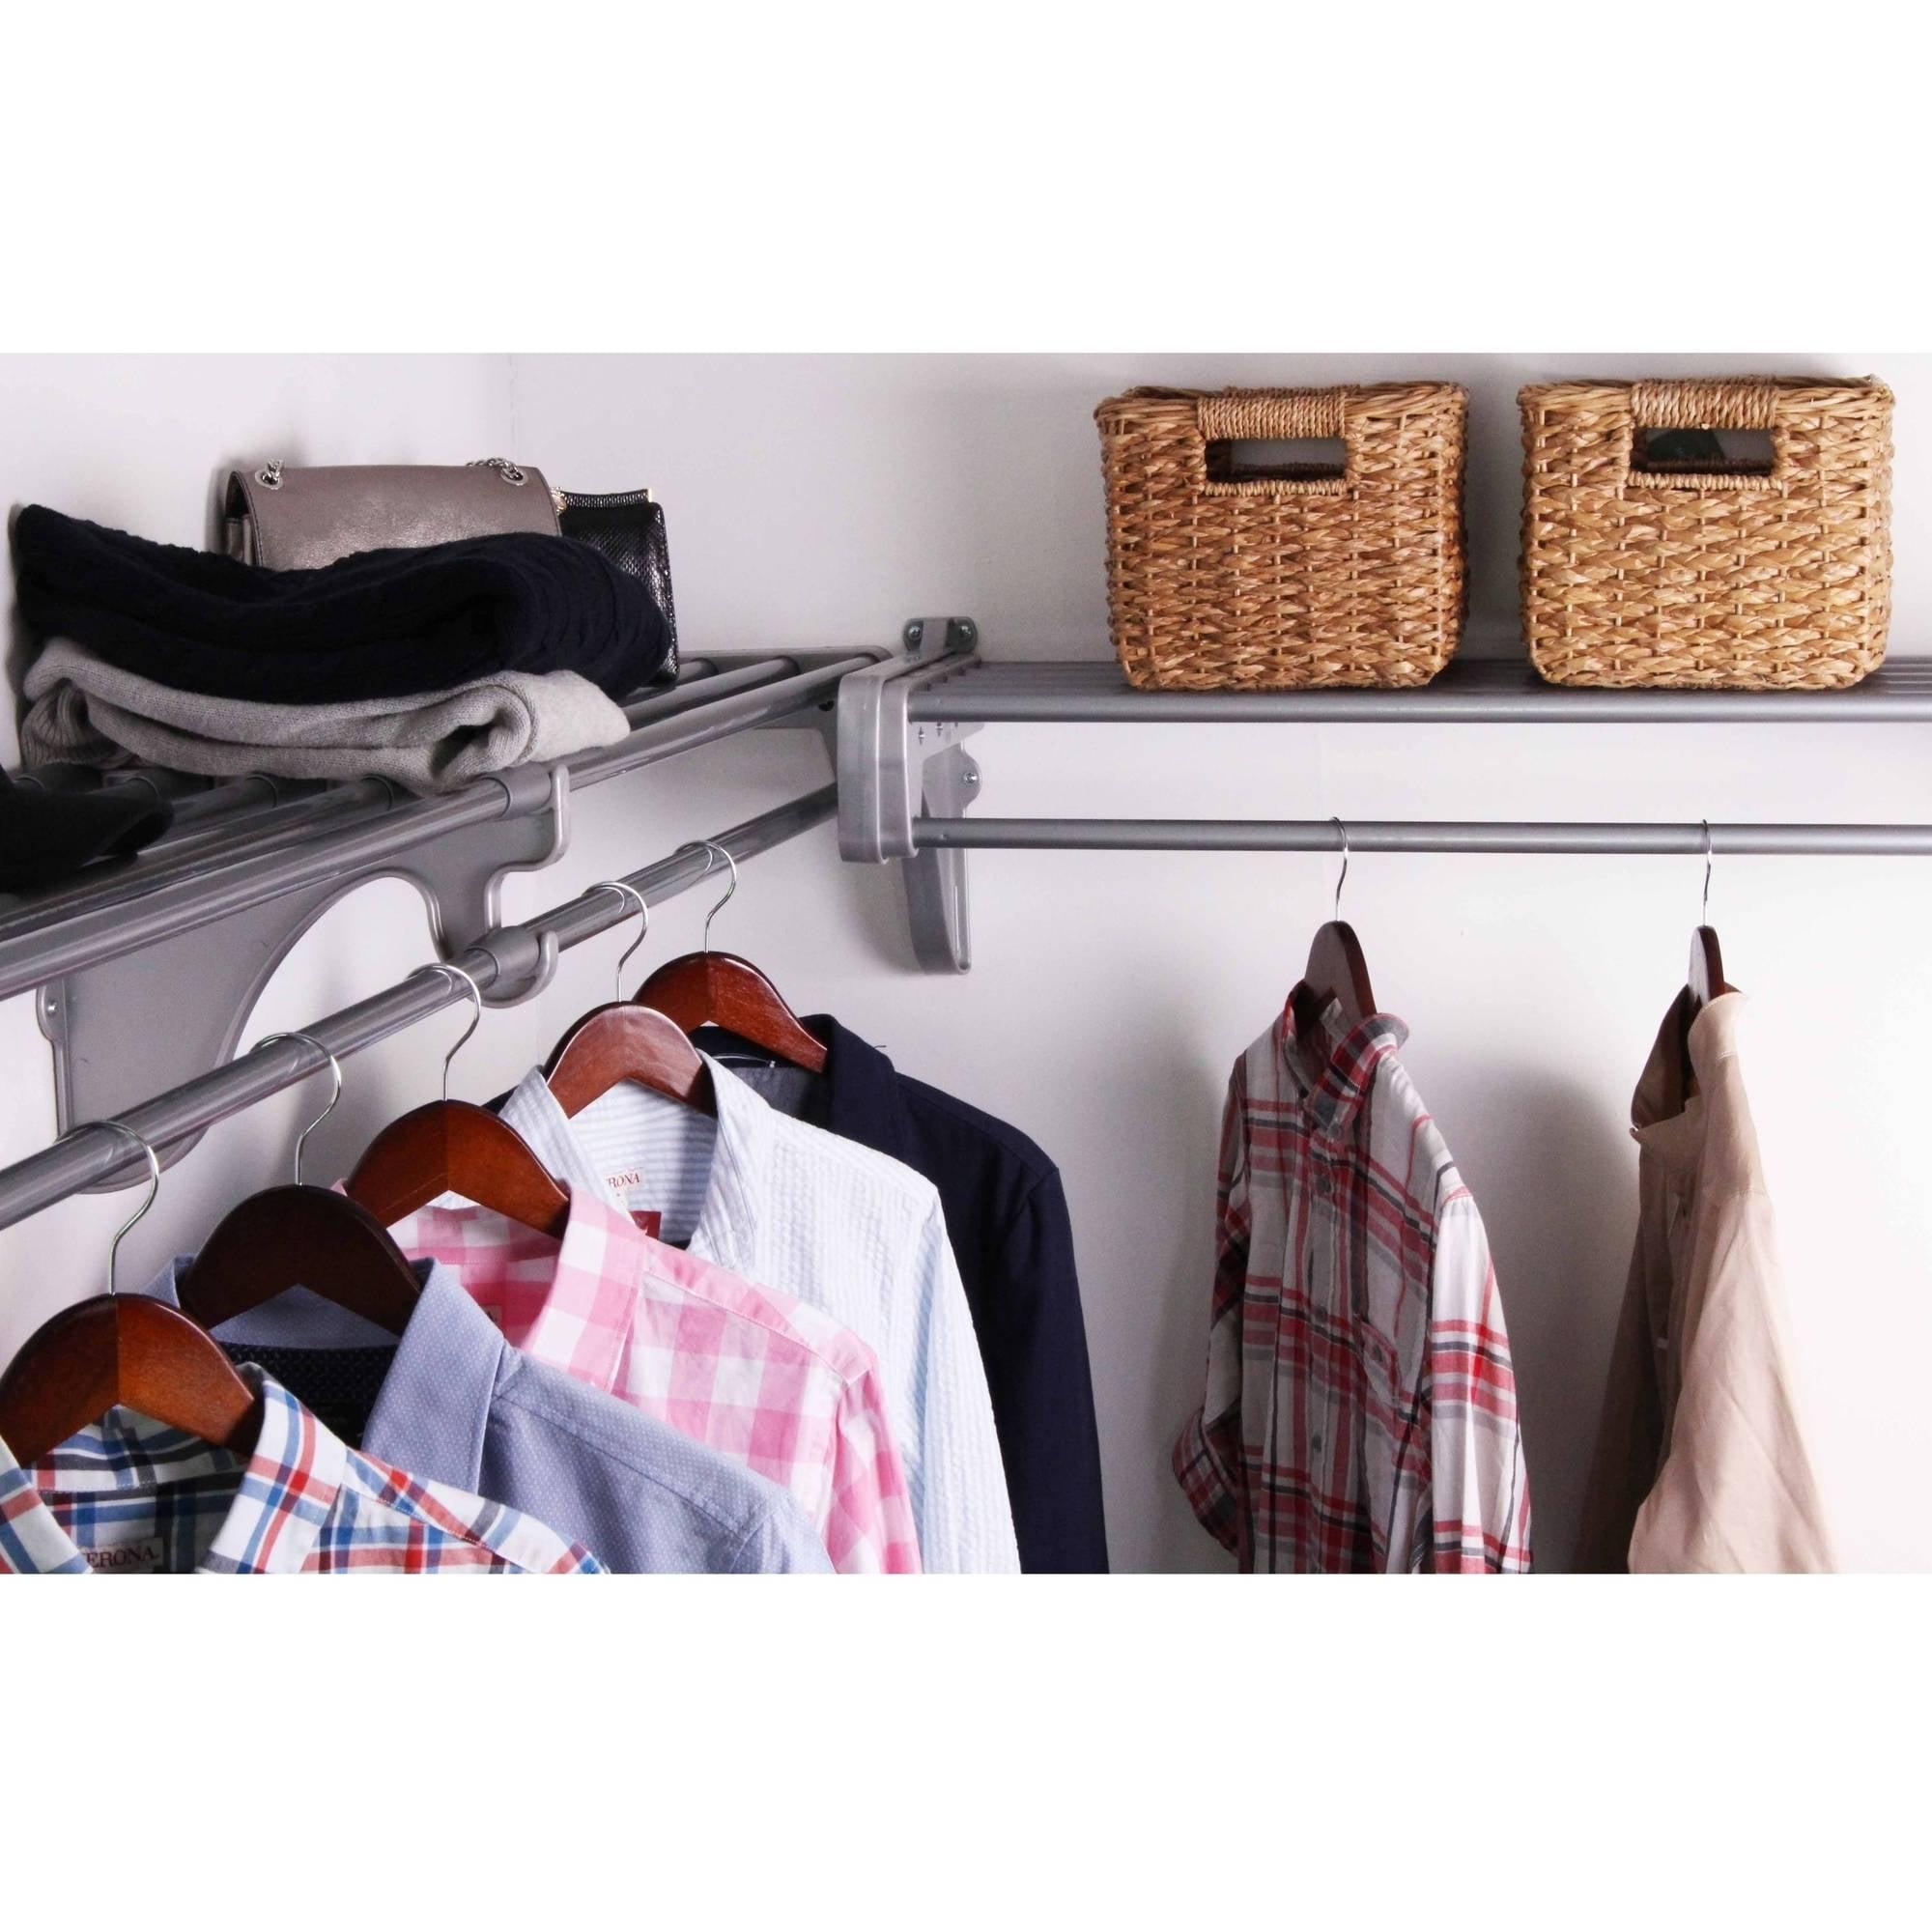 EZ Shelf 12u0027 Closet Organizer Kit, Up To 12.2u0027 Of Hanging And Shelf Space,  Silver   Walmart.com